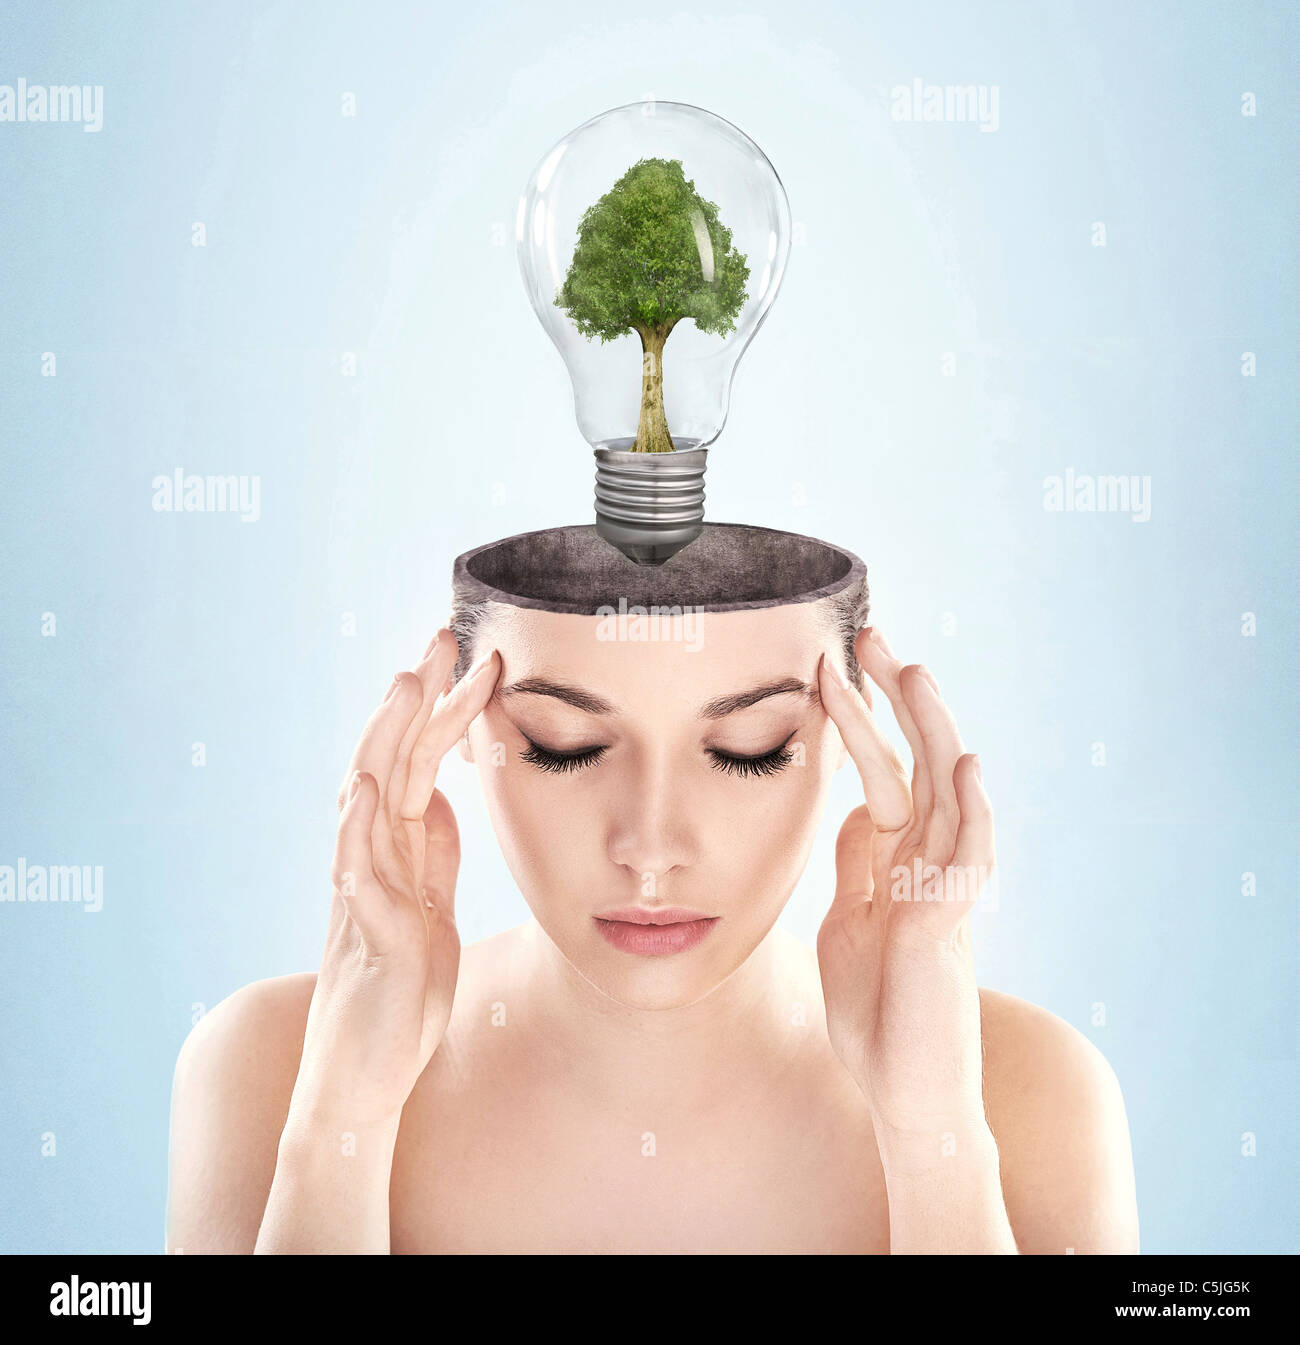 Offen denkende Frau mit grüner Energie symbol Stockbild